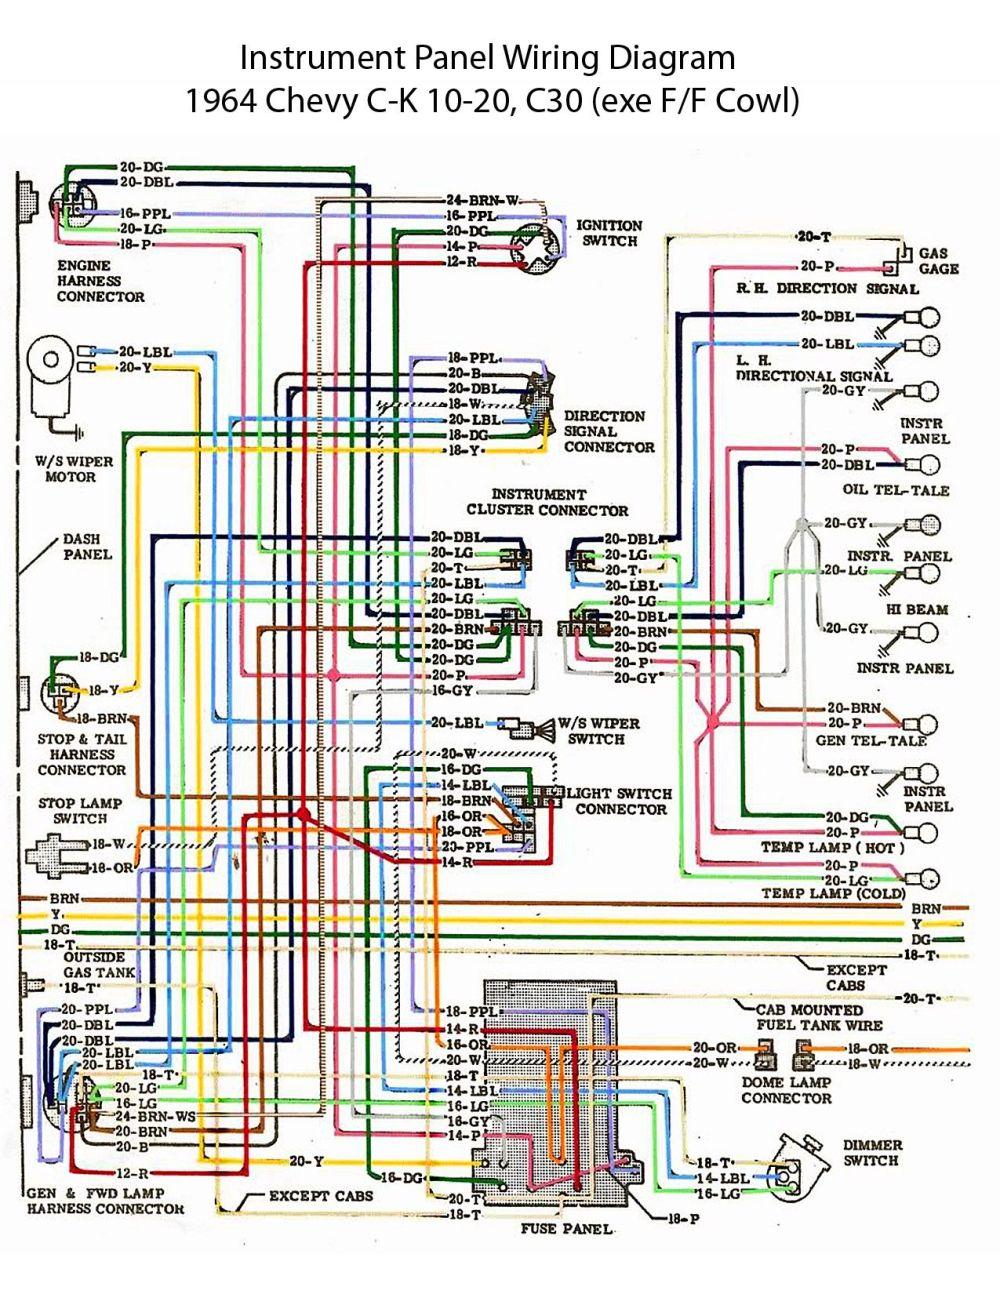 medium resolution of 29f907bf017db832106977dbff5b5b31 64 chevy c10 wiring diagram chevy truck wiring diagram 64 2004 silverado tail light wiring